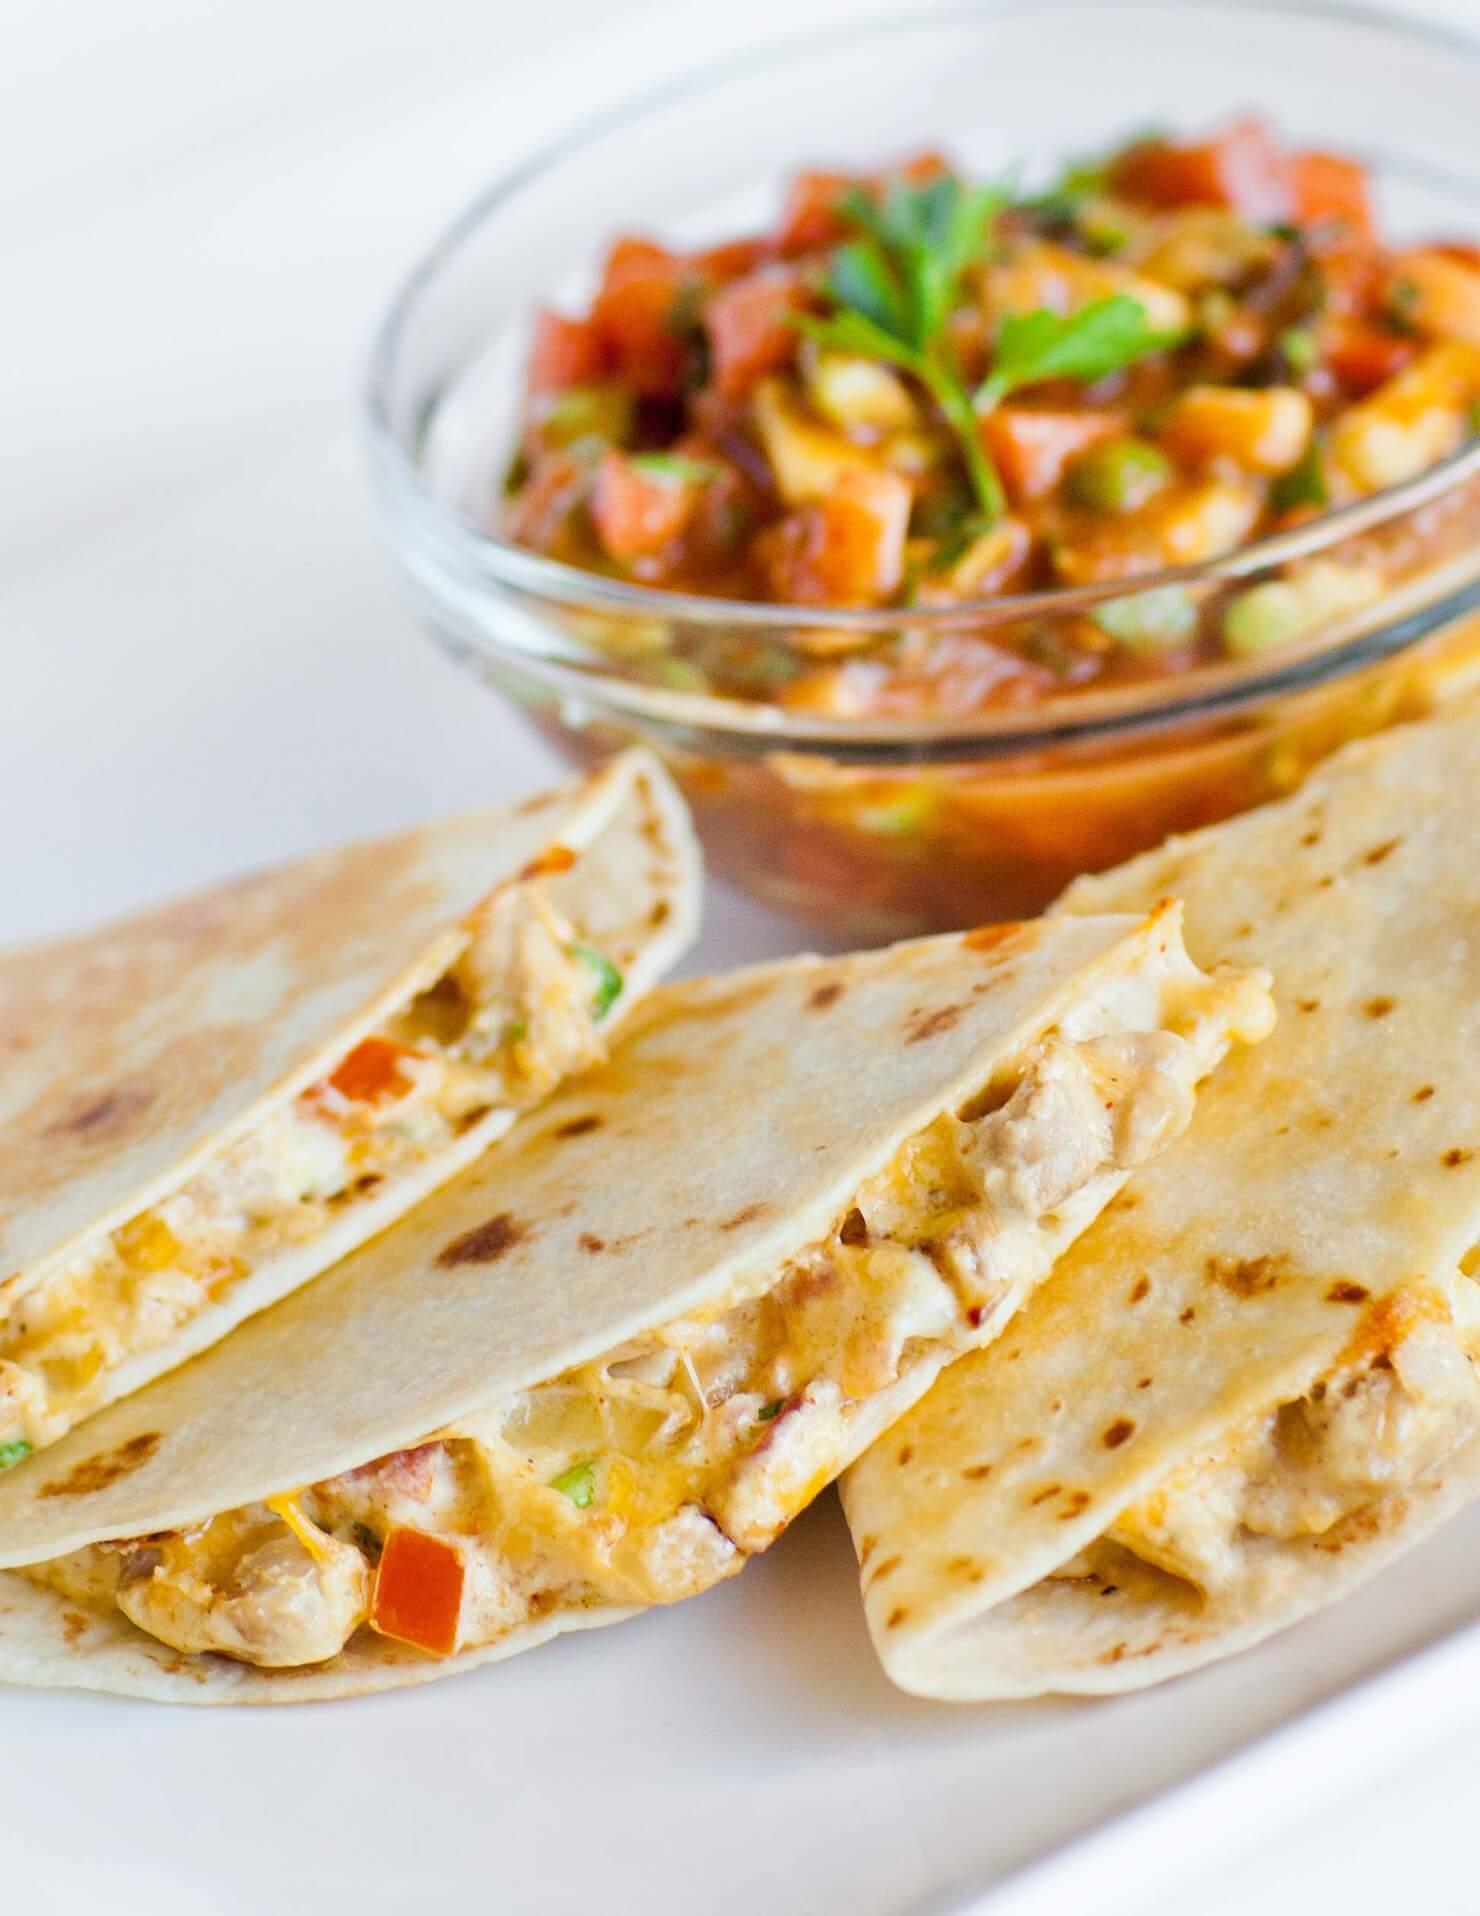 cheesy chicken quesadillas with salsa